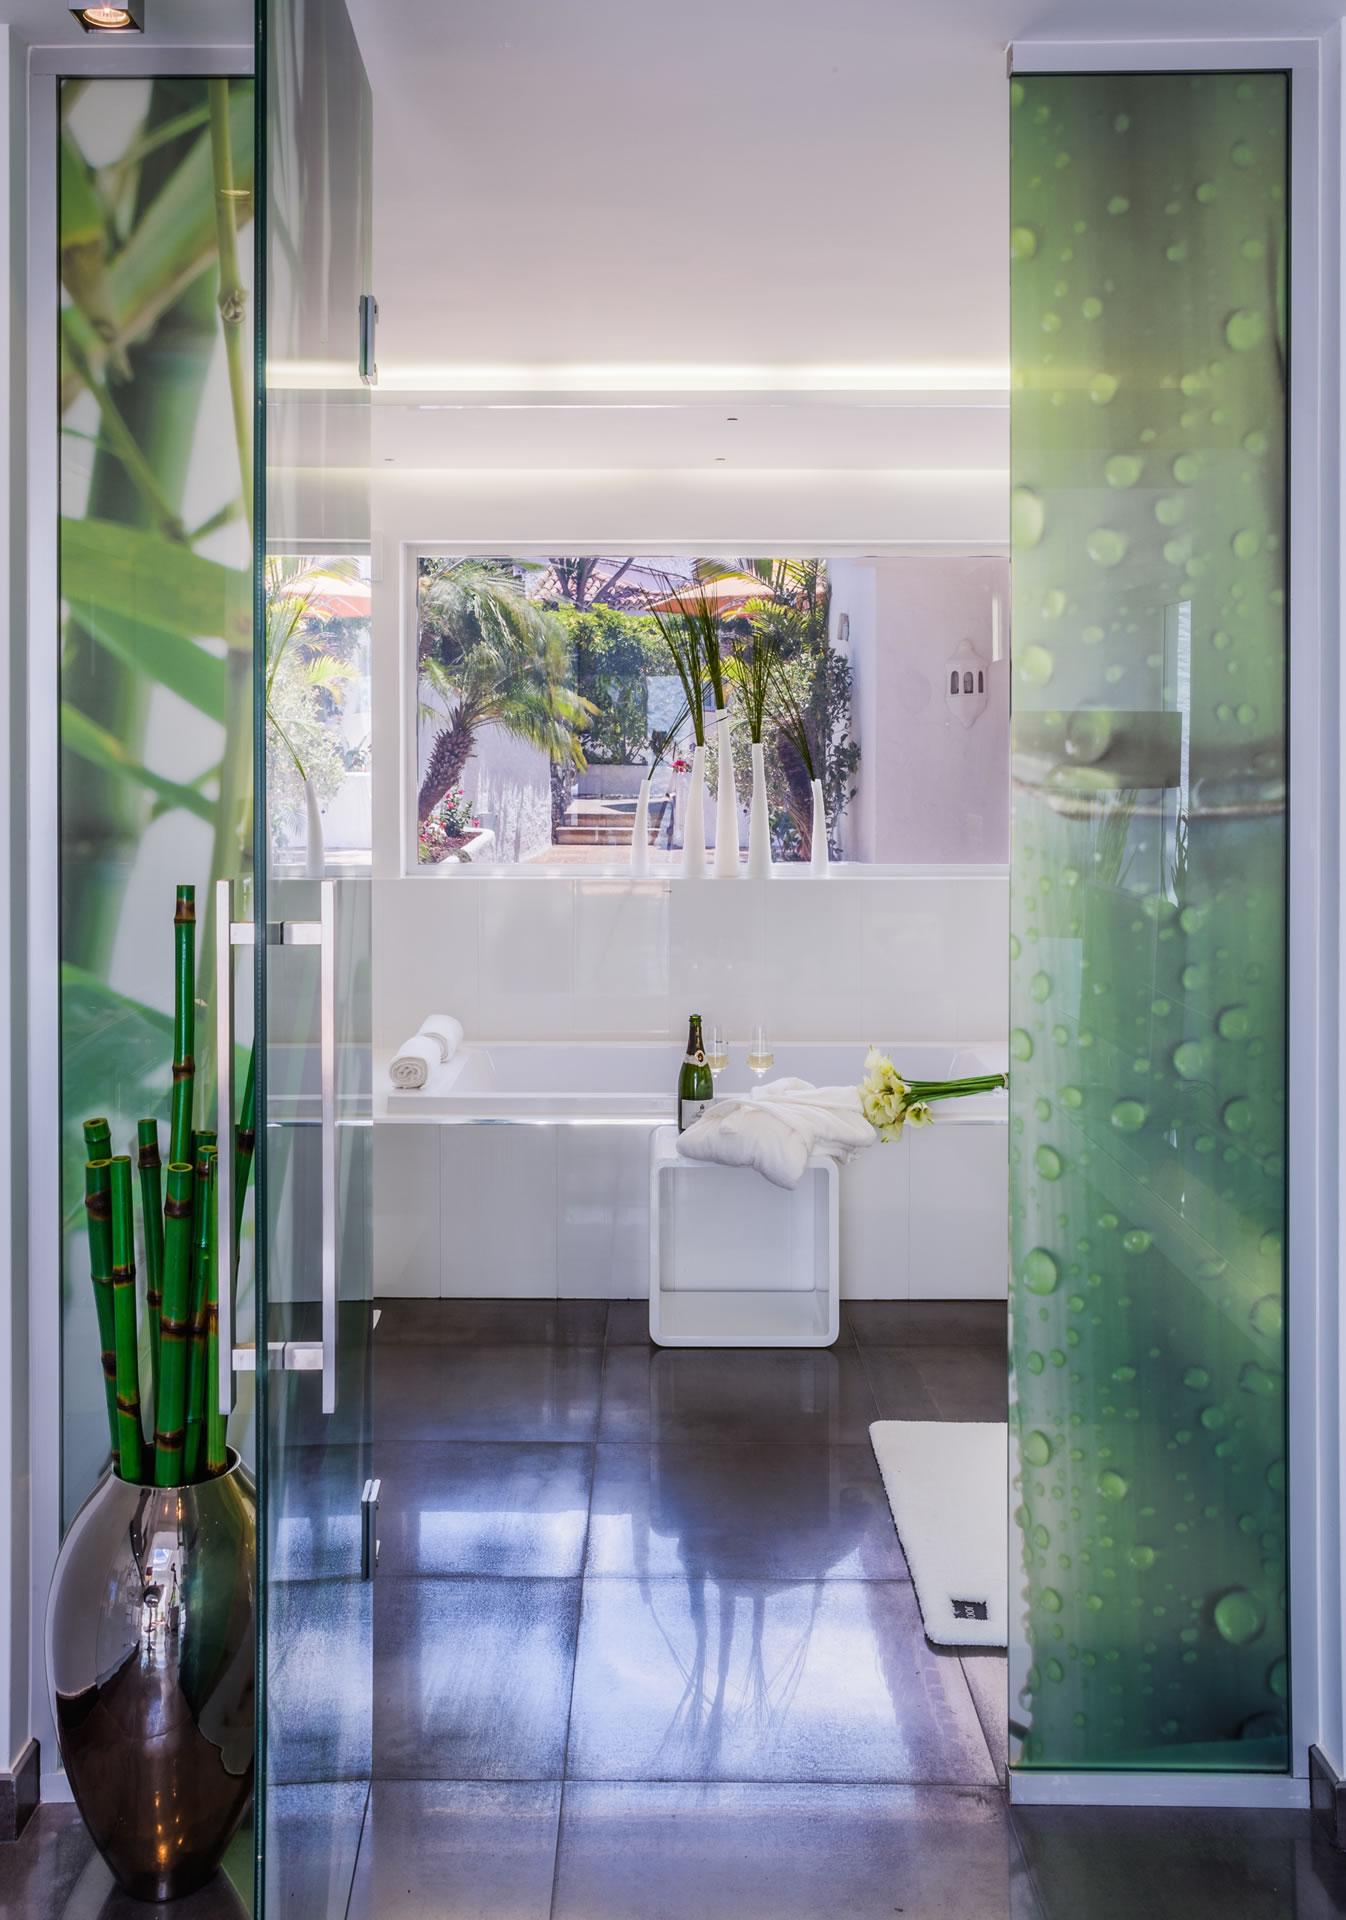 Casa Buenavista im Jardin de la Paz: Luxus-Studio mit Panoramablick